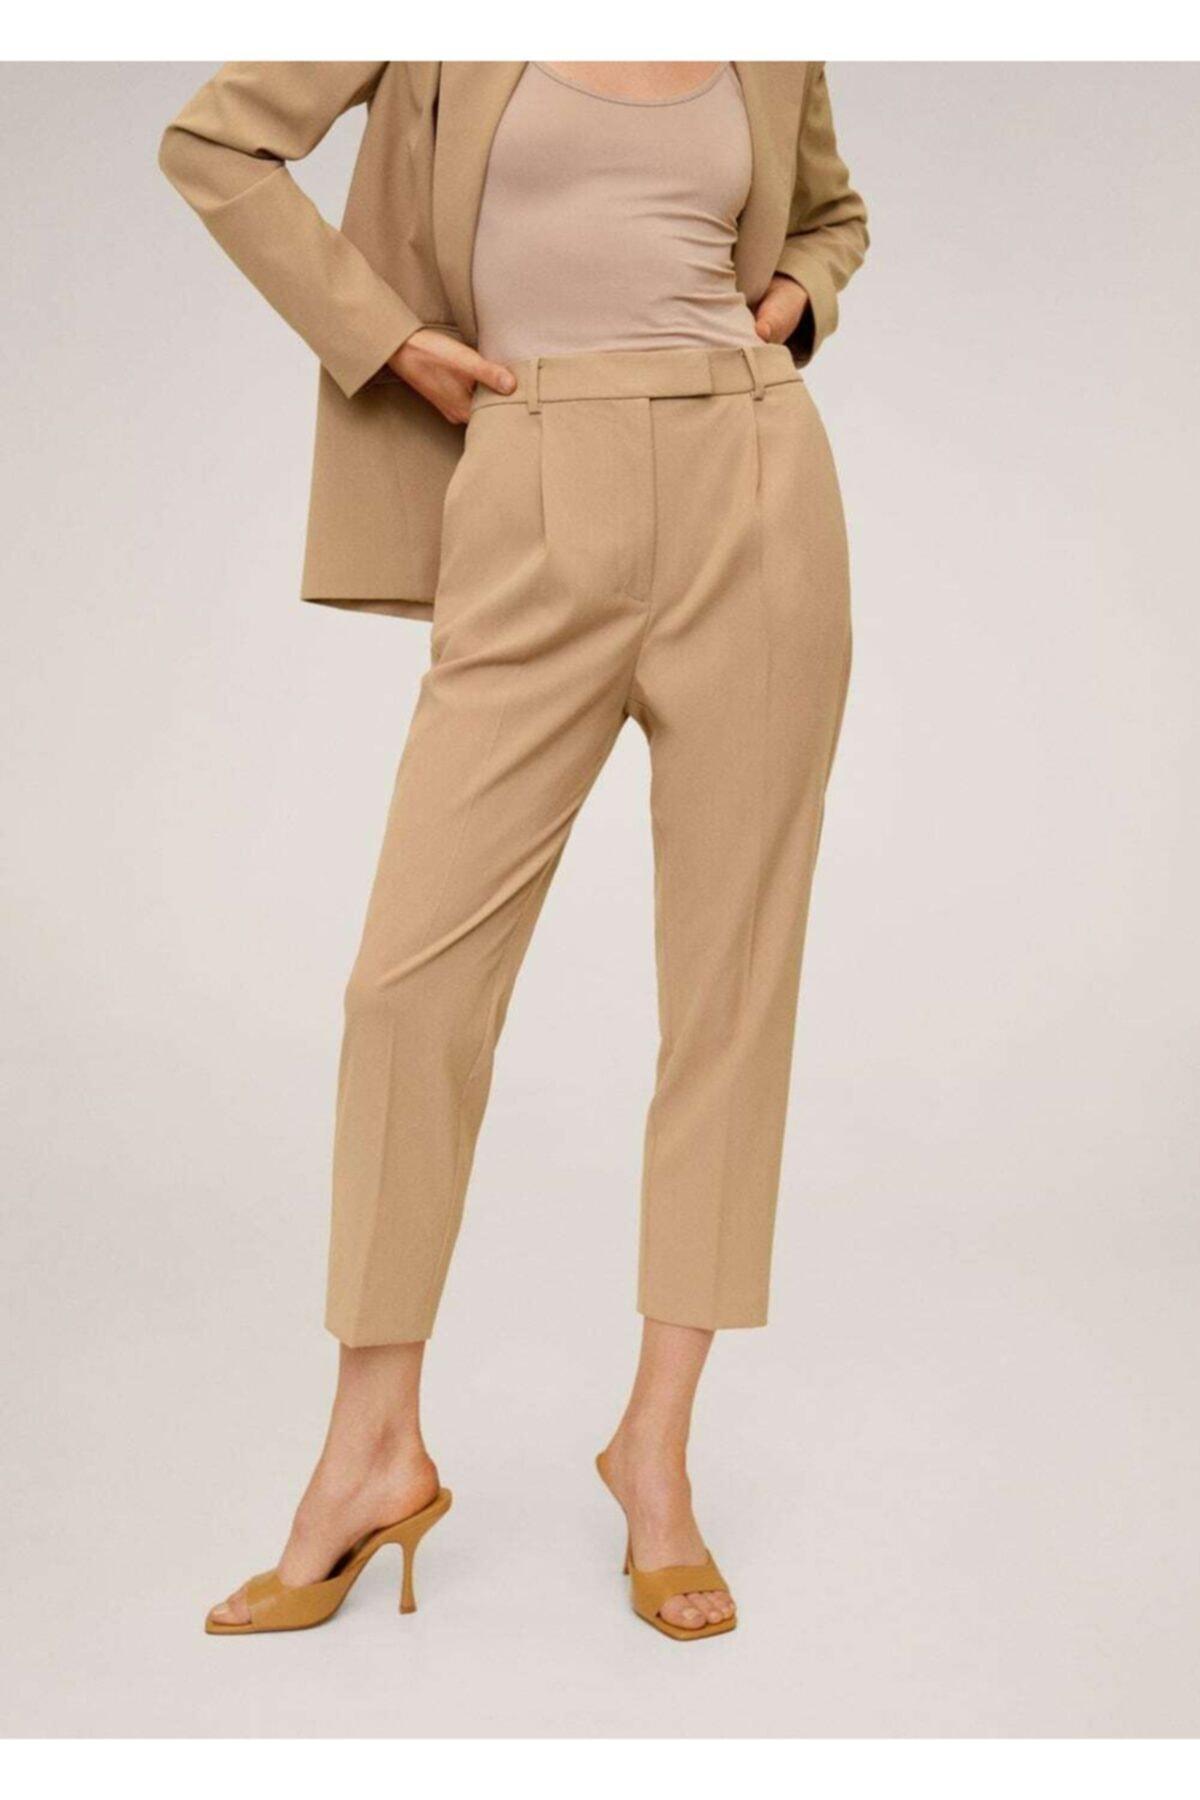 MANGO Woman Kadın Orta Kahverengi Pilili Kısa Paçalı Pantolon 67054404 2